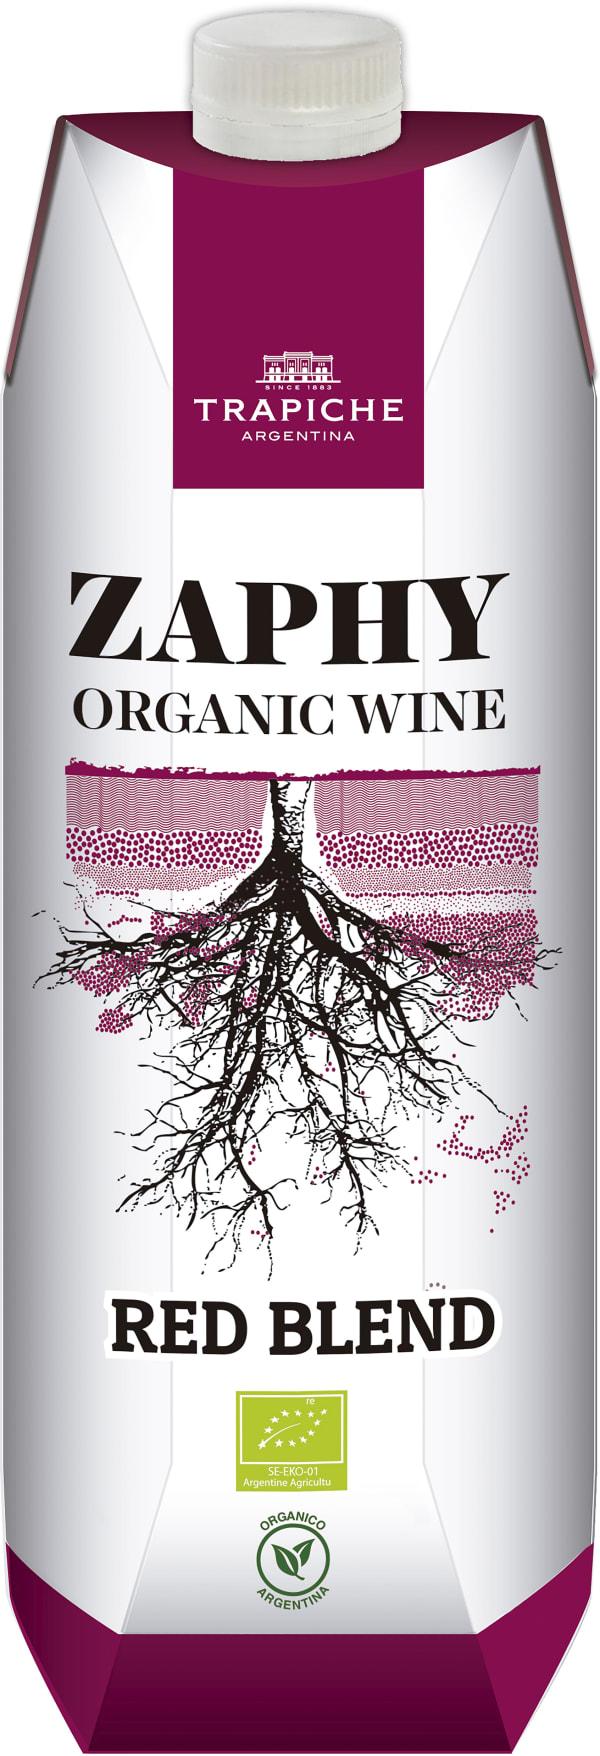 Trapiche Zaphy Organic 2016 carton package